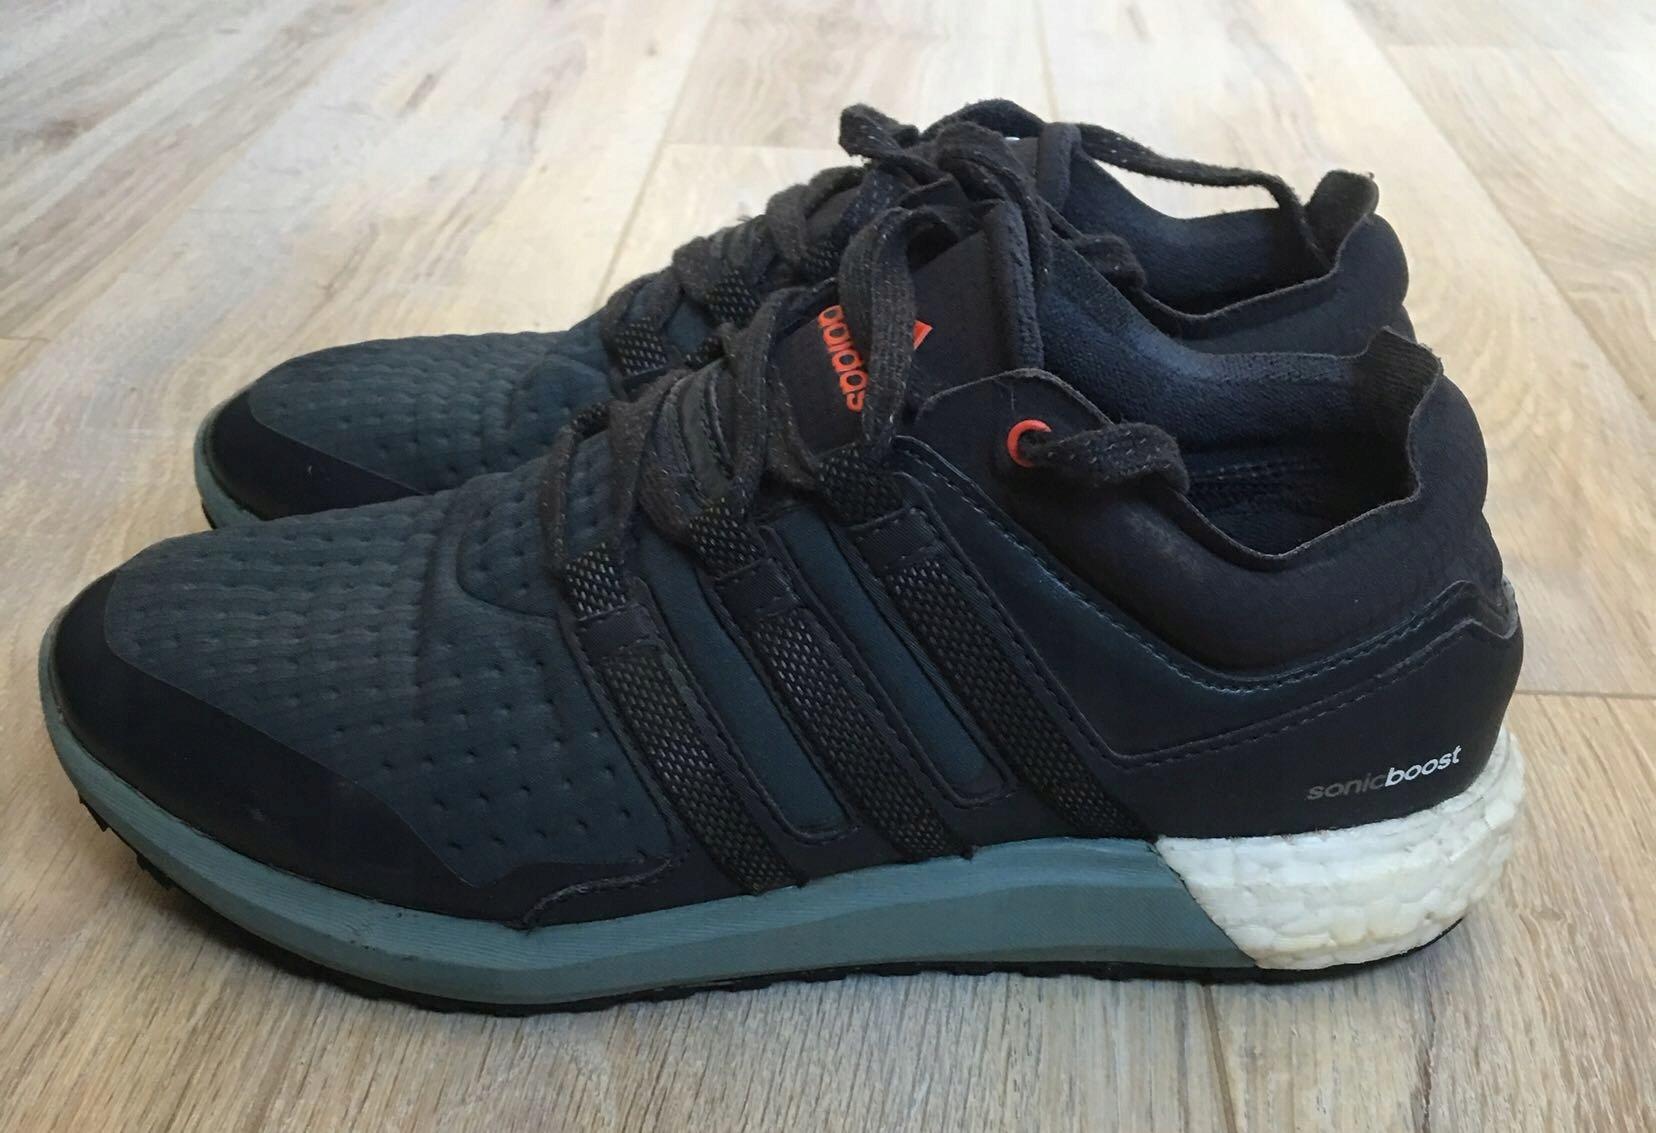 no sale tax 2018 shoes san francisco Adidas Sonic Boost Climaheat - buty do biegania